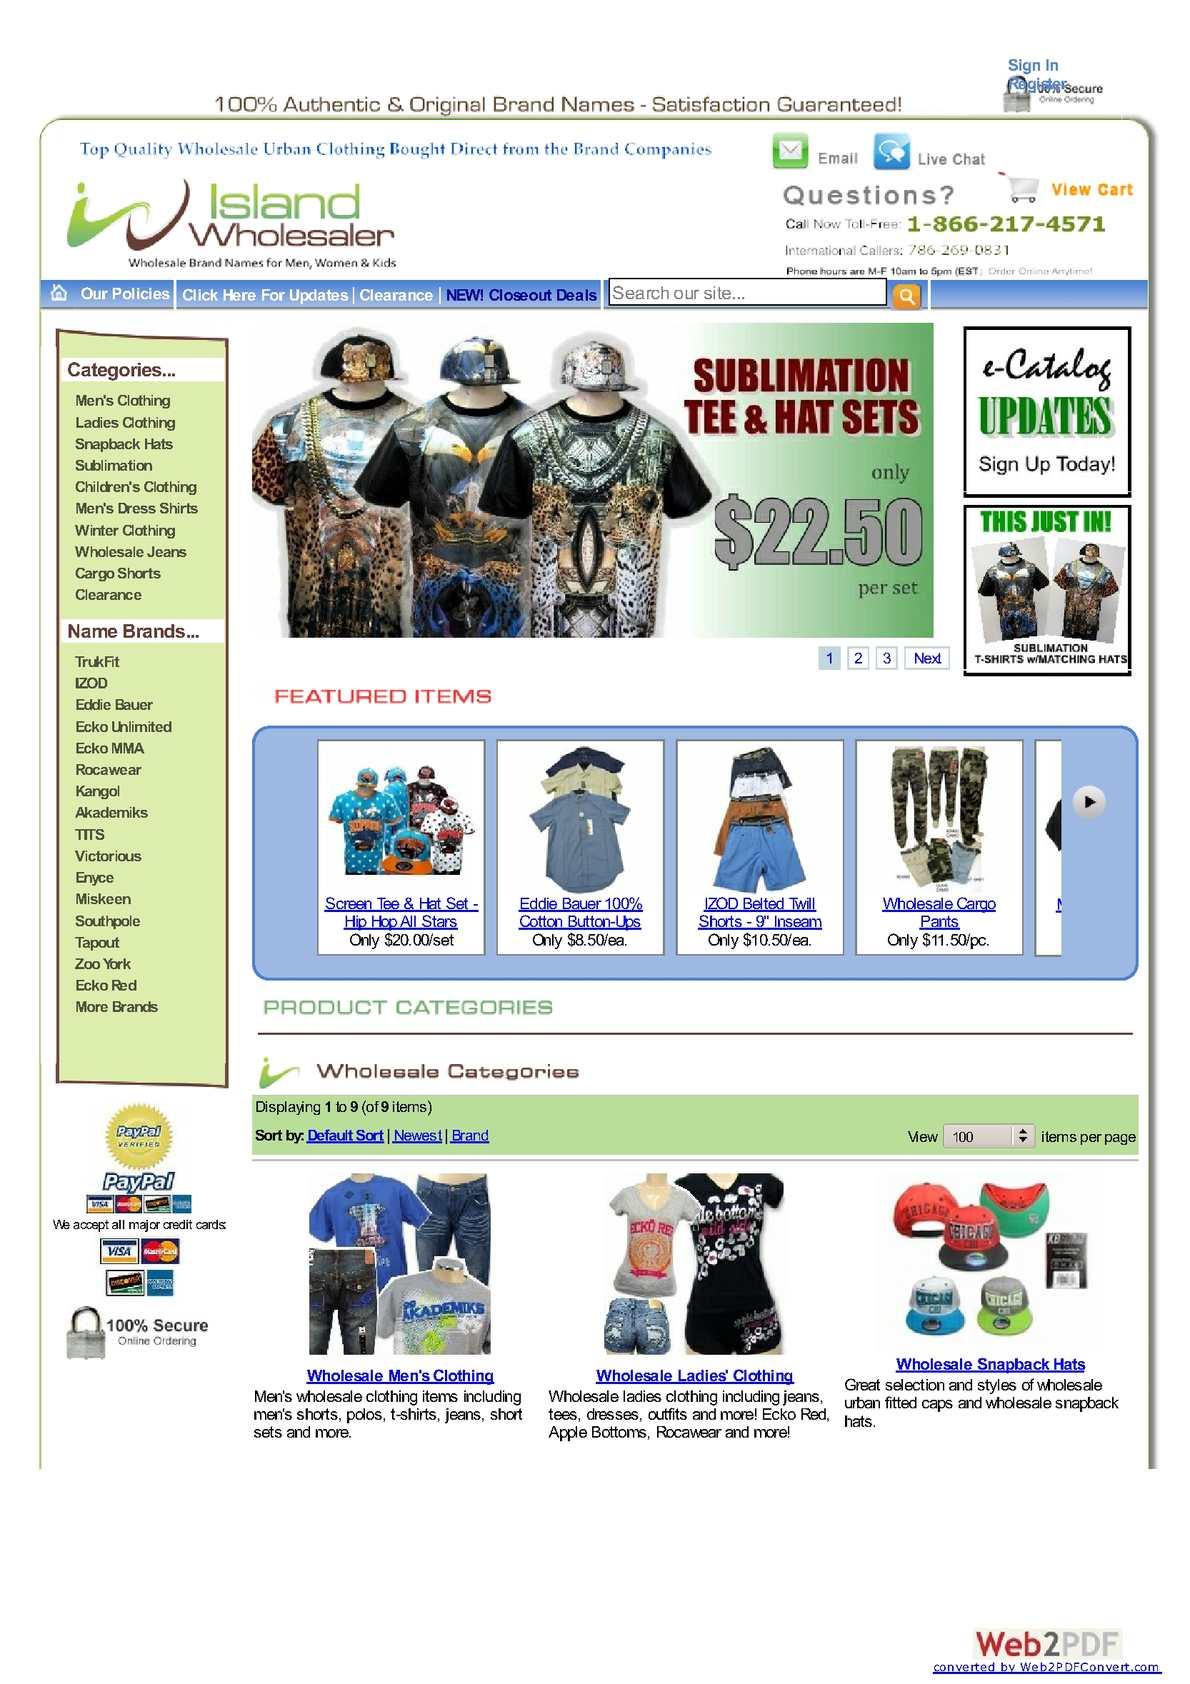 Calaméo - Buy wholesale urban wear clothing, men's clothing